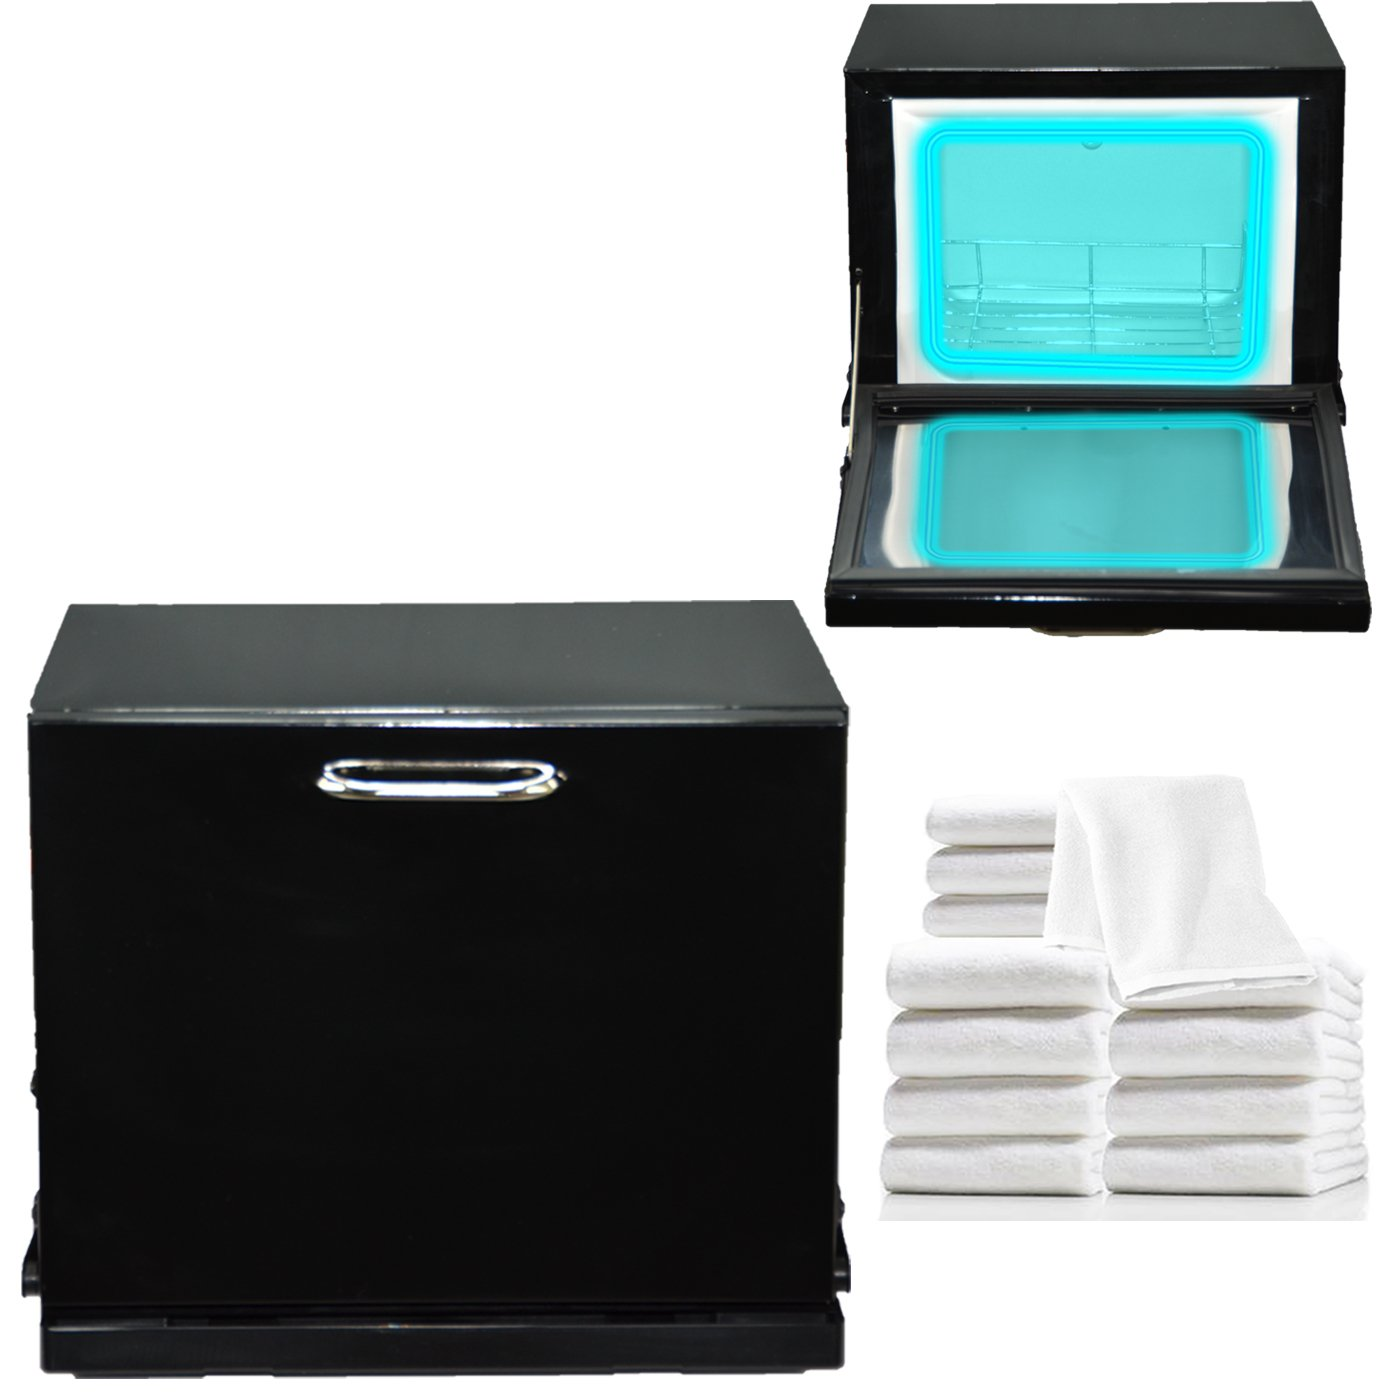 InkBed Black Compact 2-in-1 Towel Warmer & Ultraviolet Sterilizer Cabinet (w/Towels)